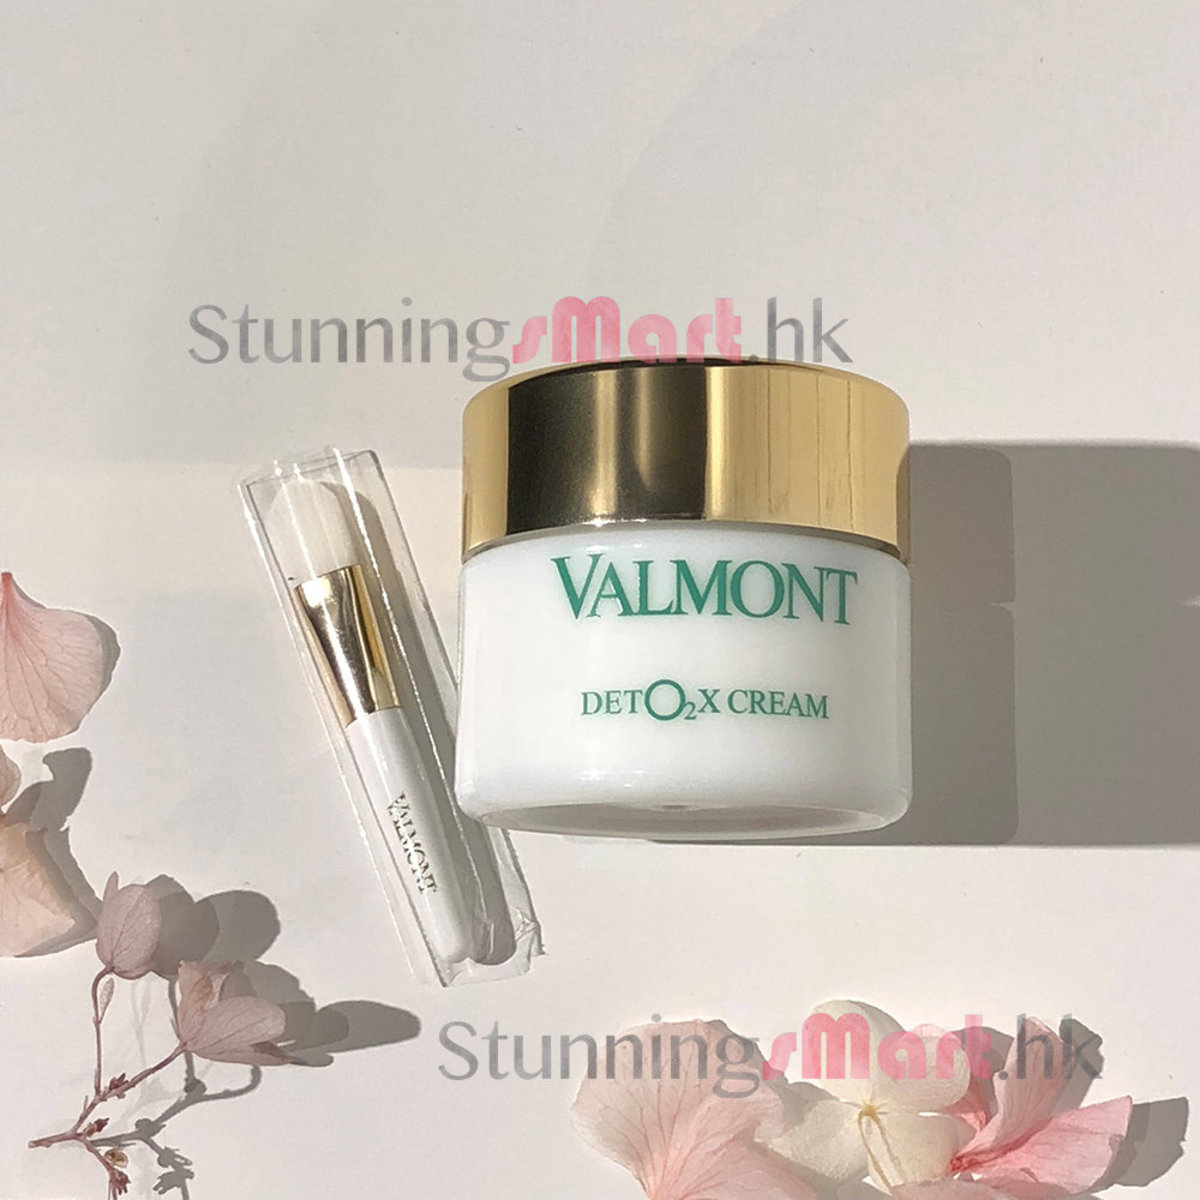 [PROMOTION] DetO2x Cream 45.0g/ml [Parallel Import]